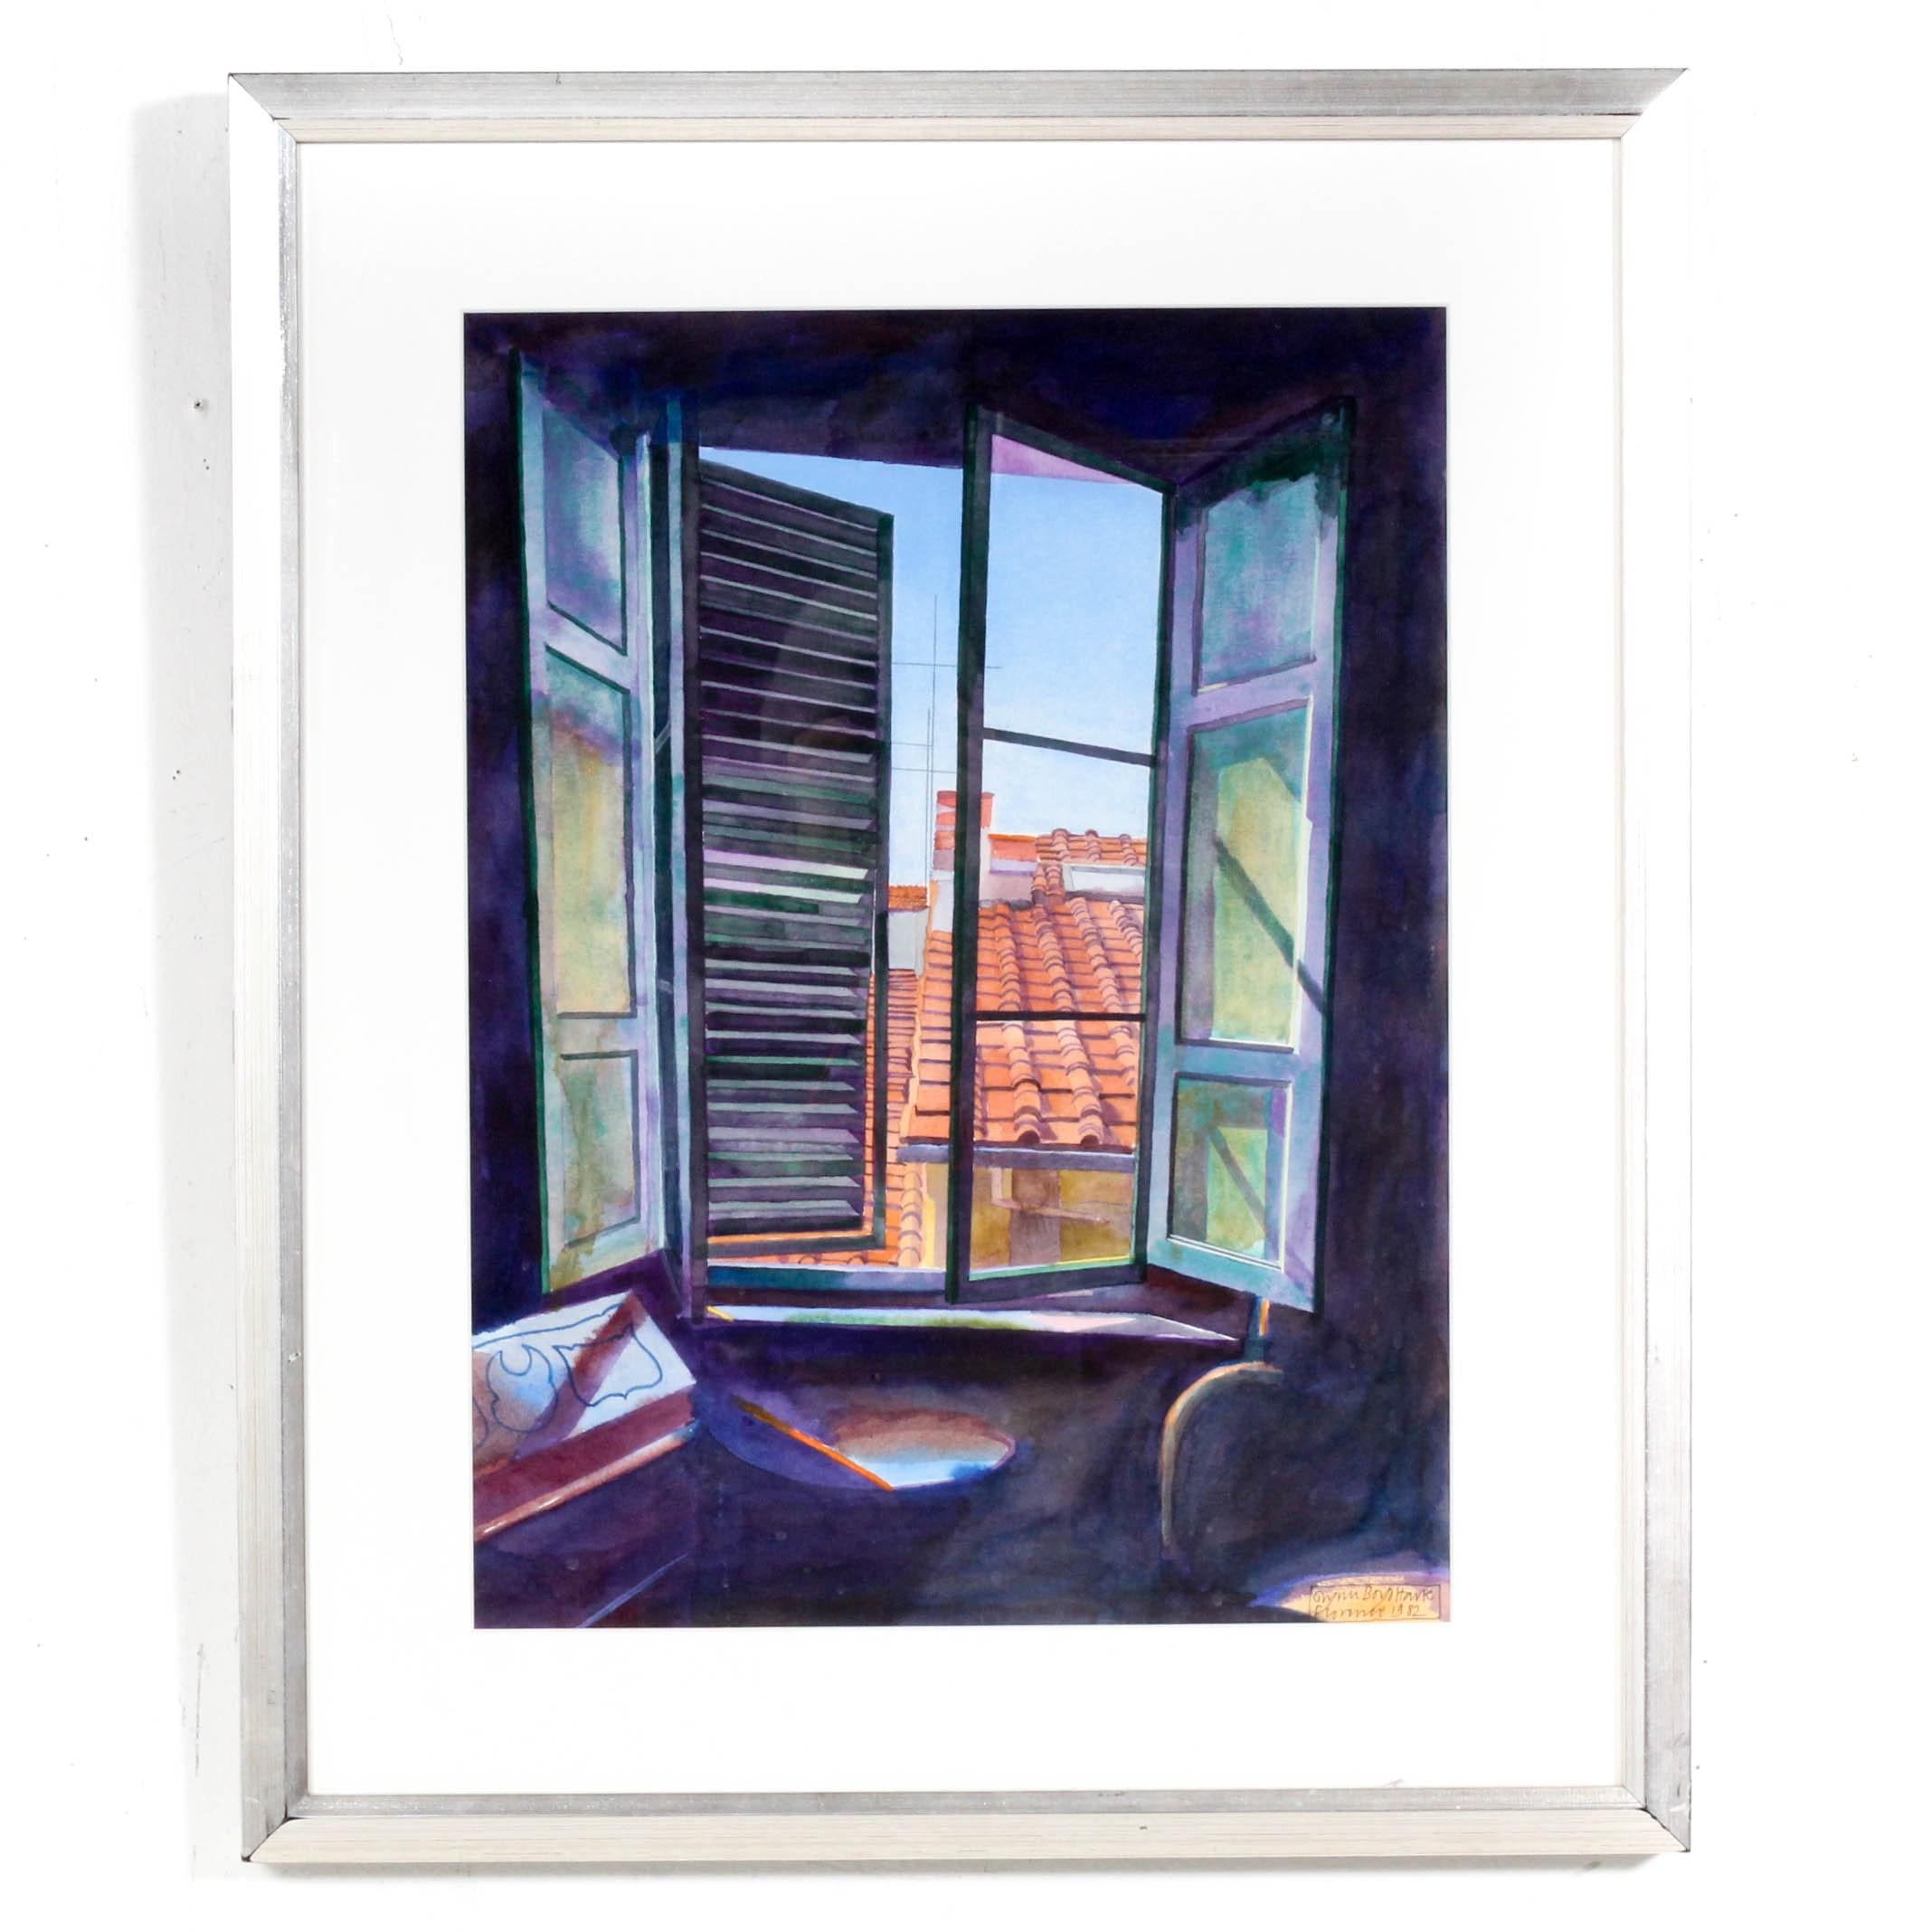 Vintage Watercolor Depicting Roof Scene From Open Window